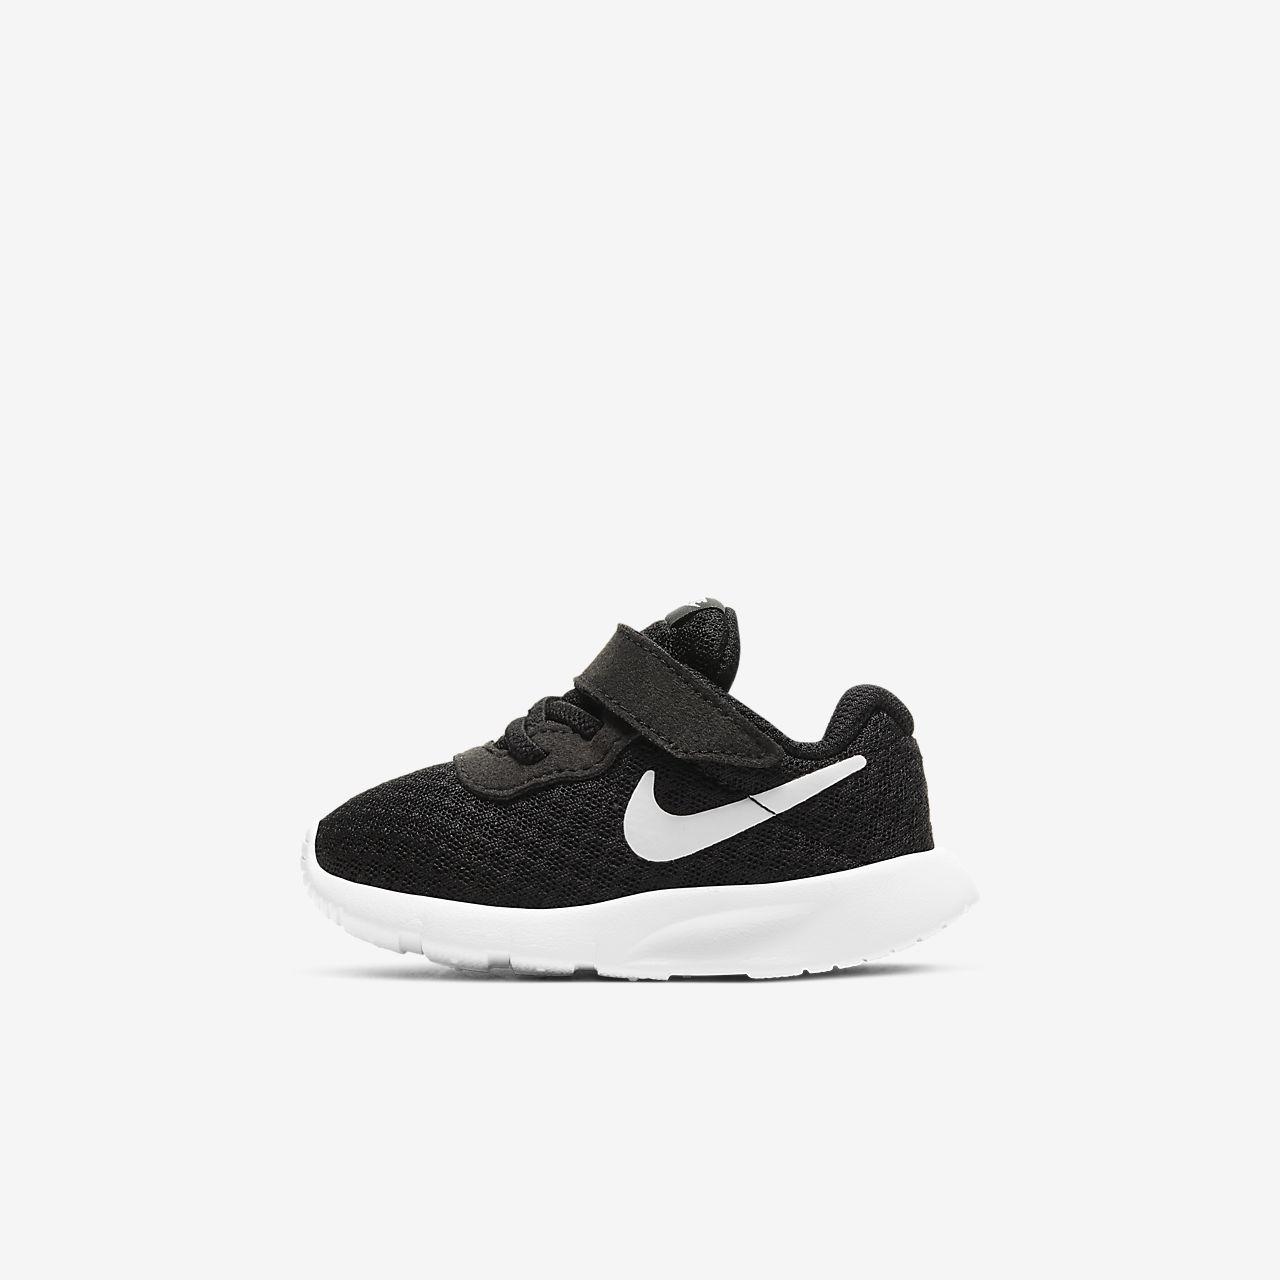 timeless design 75f39 79b82 ... Chaussure Nike Tanjun pour Bébé Petit enfant (17-27)